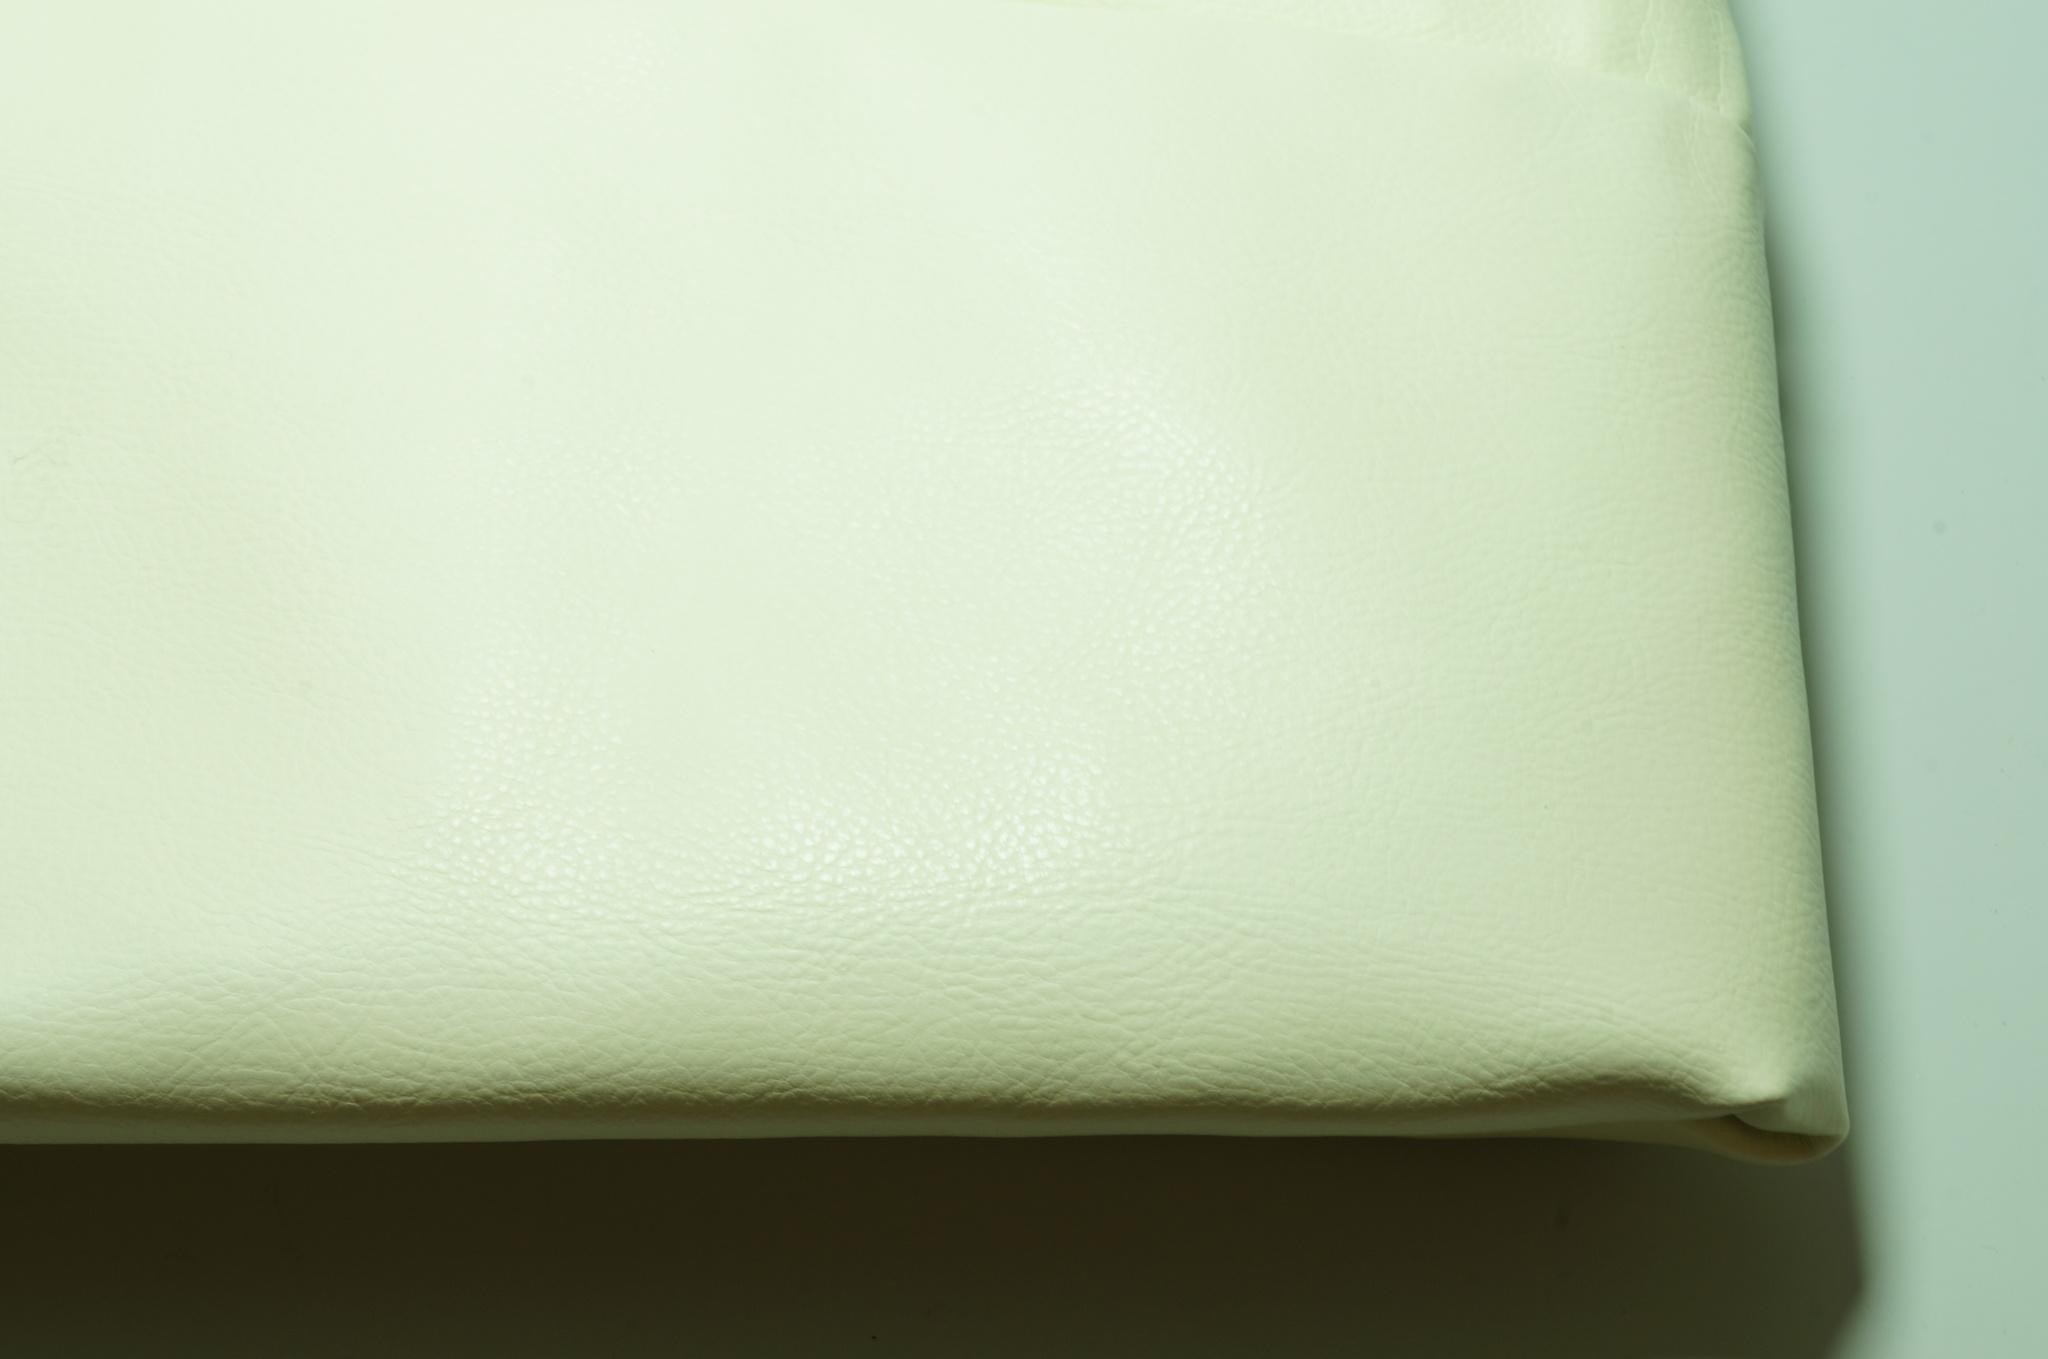 Обшивка потолка Газ 21 кожзам